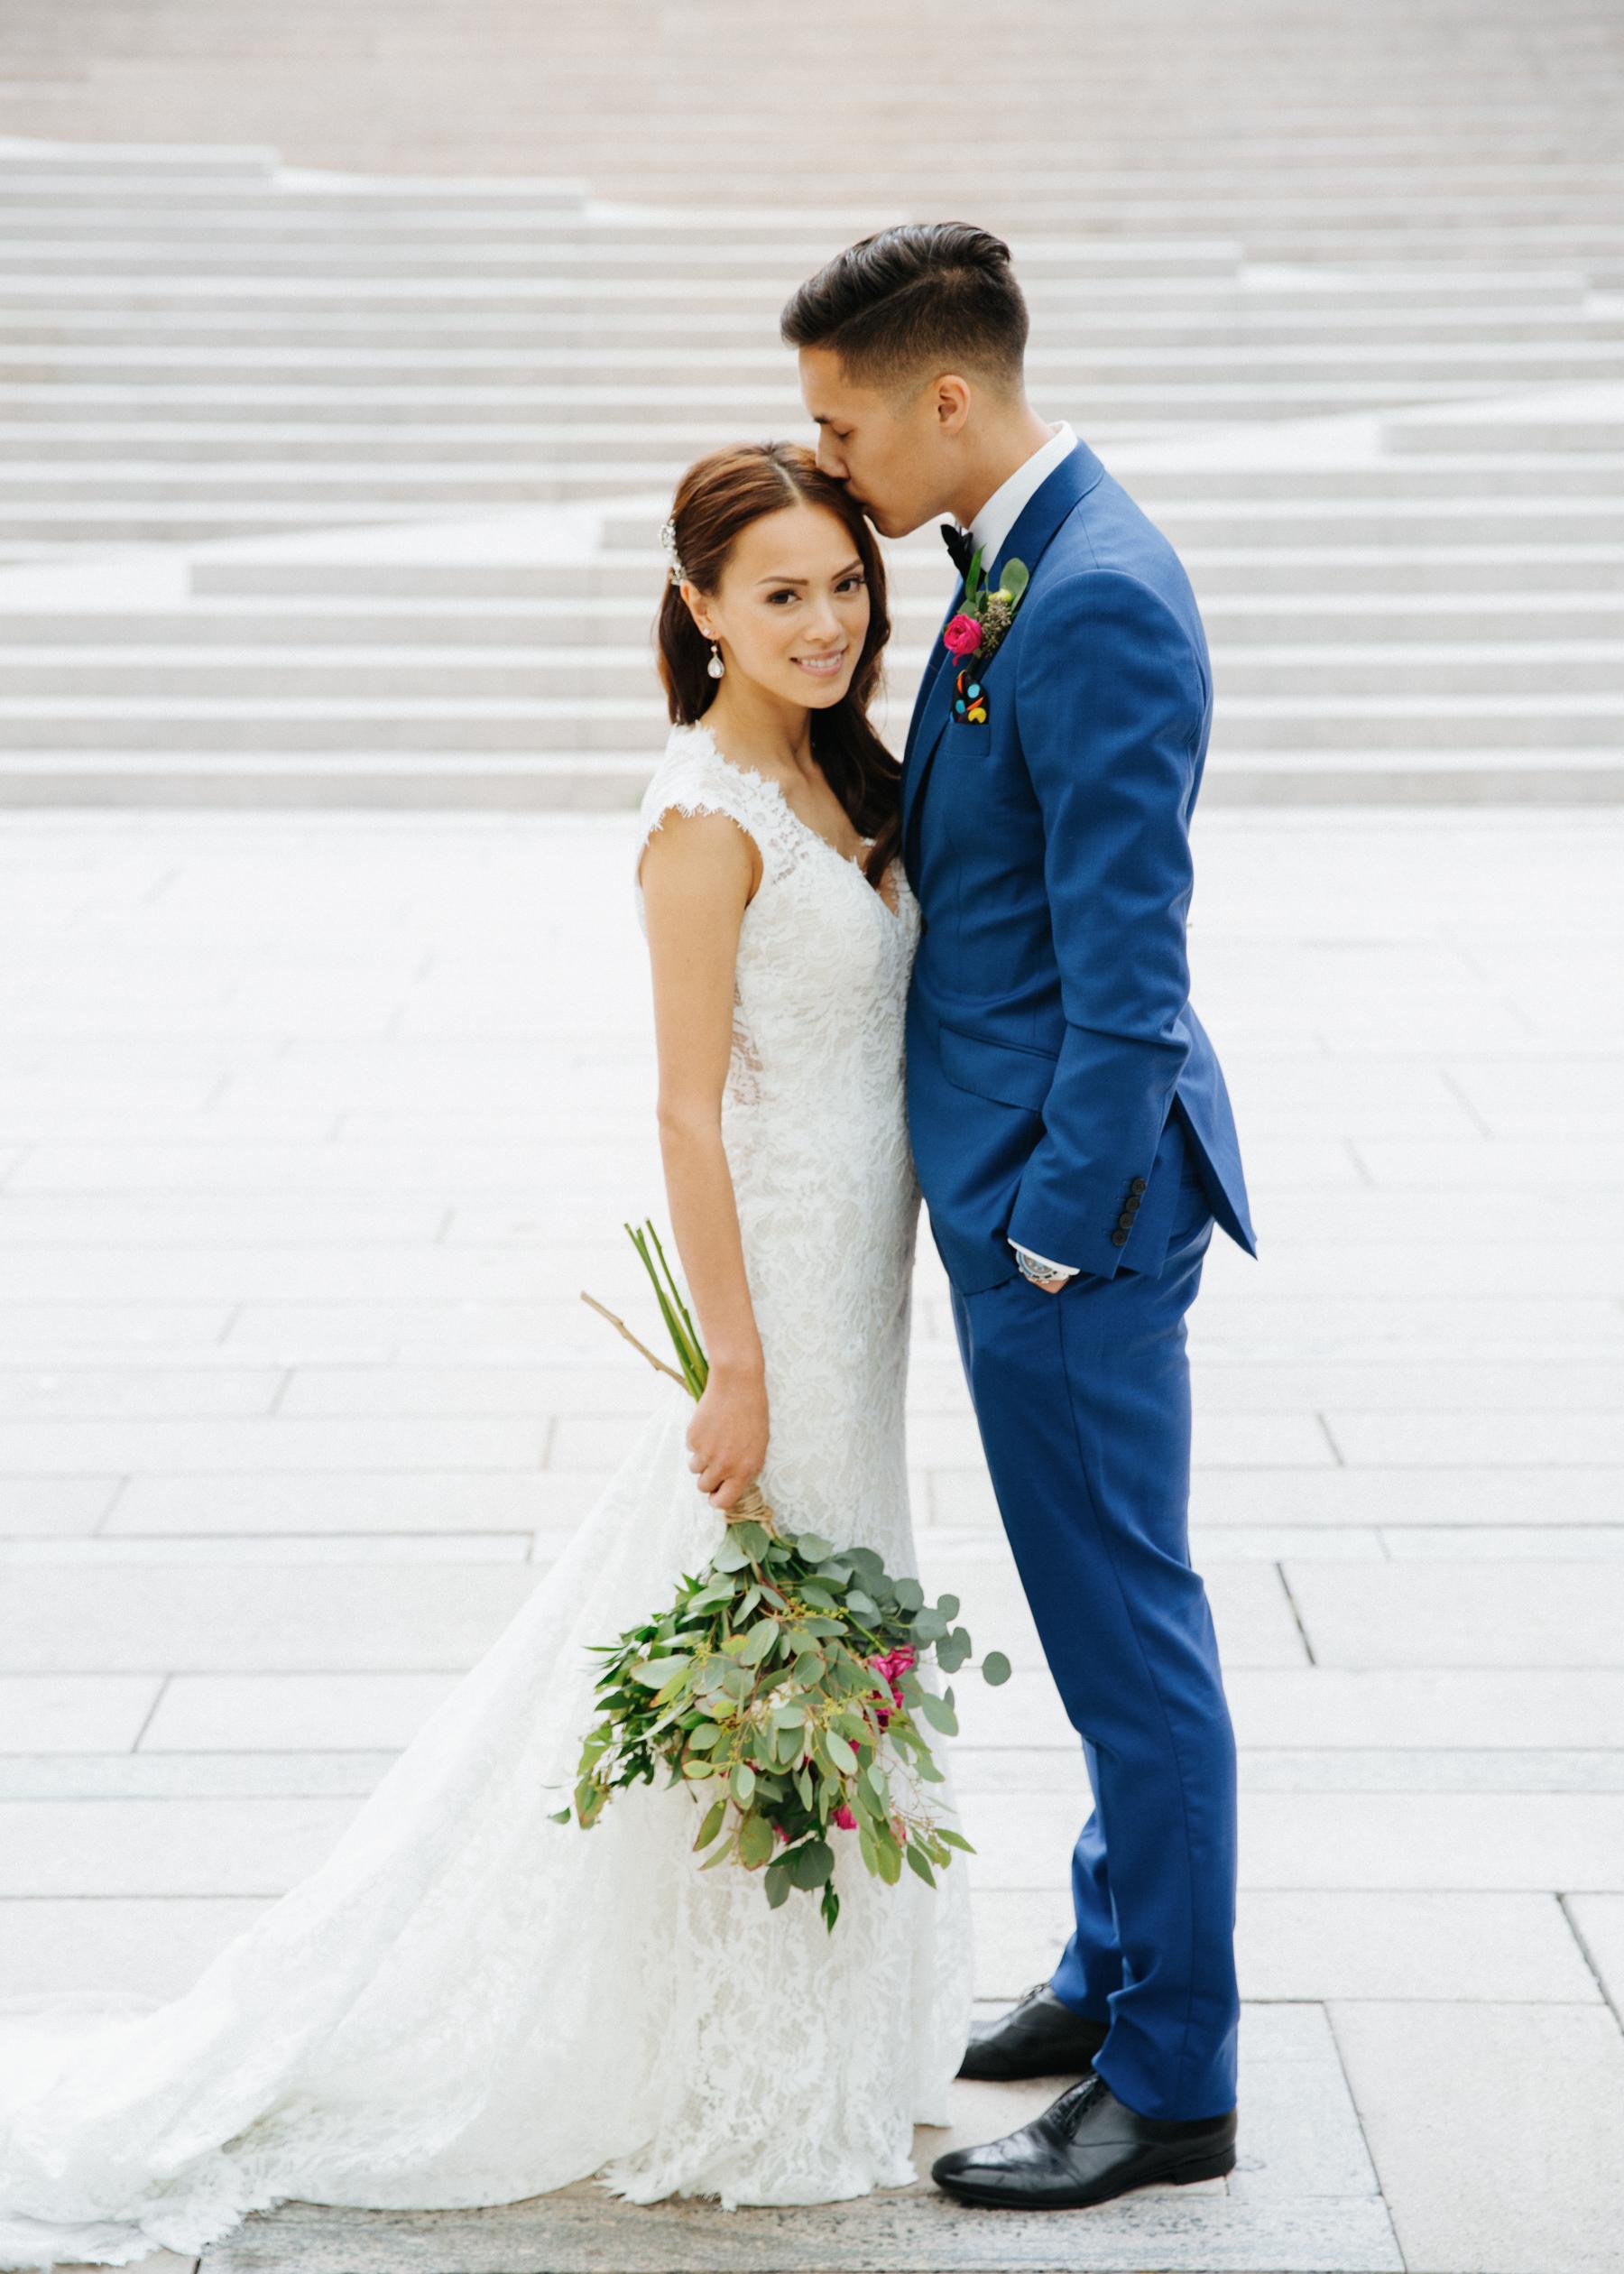 kaoverii_silva_photographer_via-herafilms_kieu_kaz_wedding-20.jpg